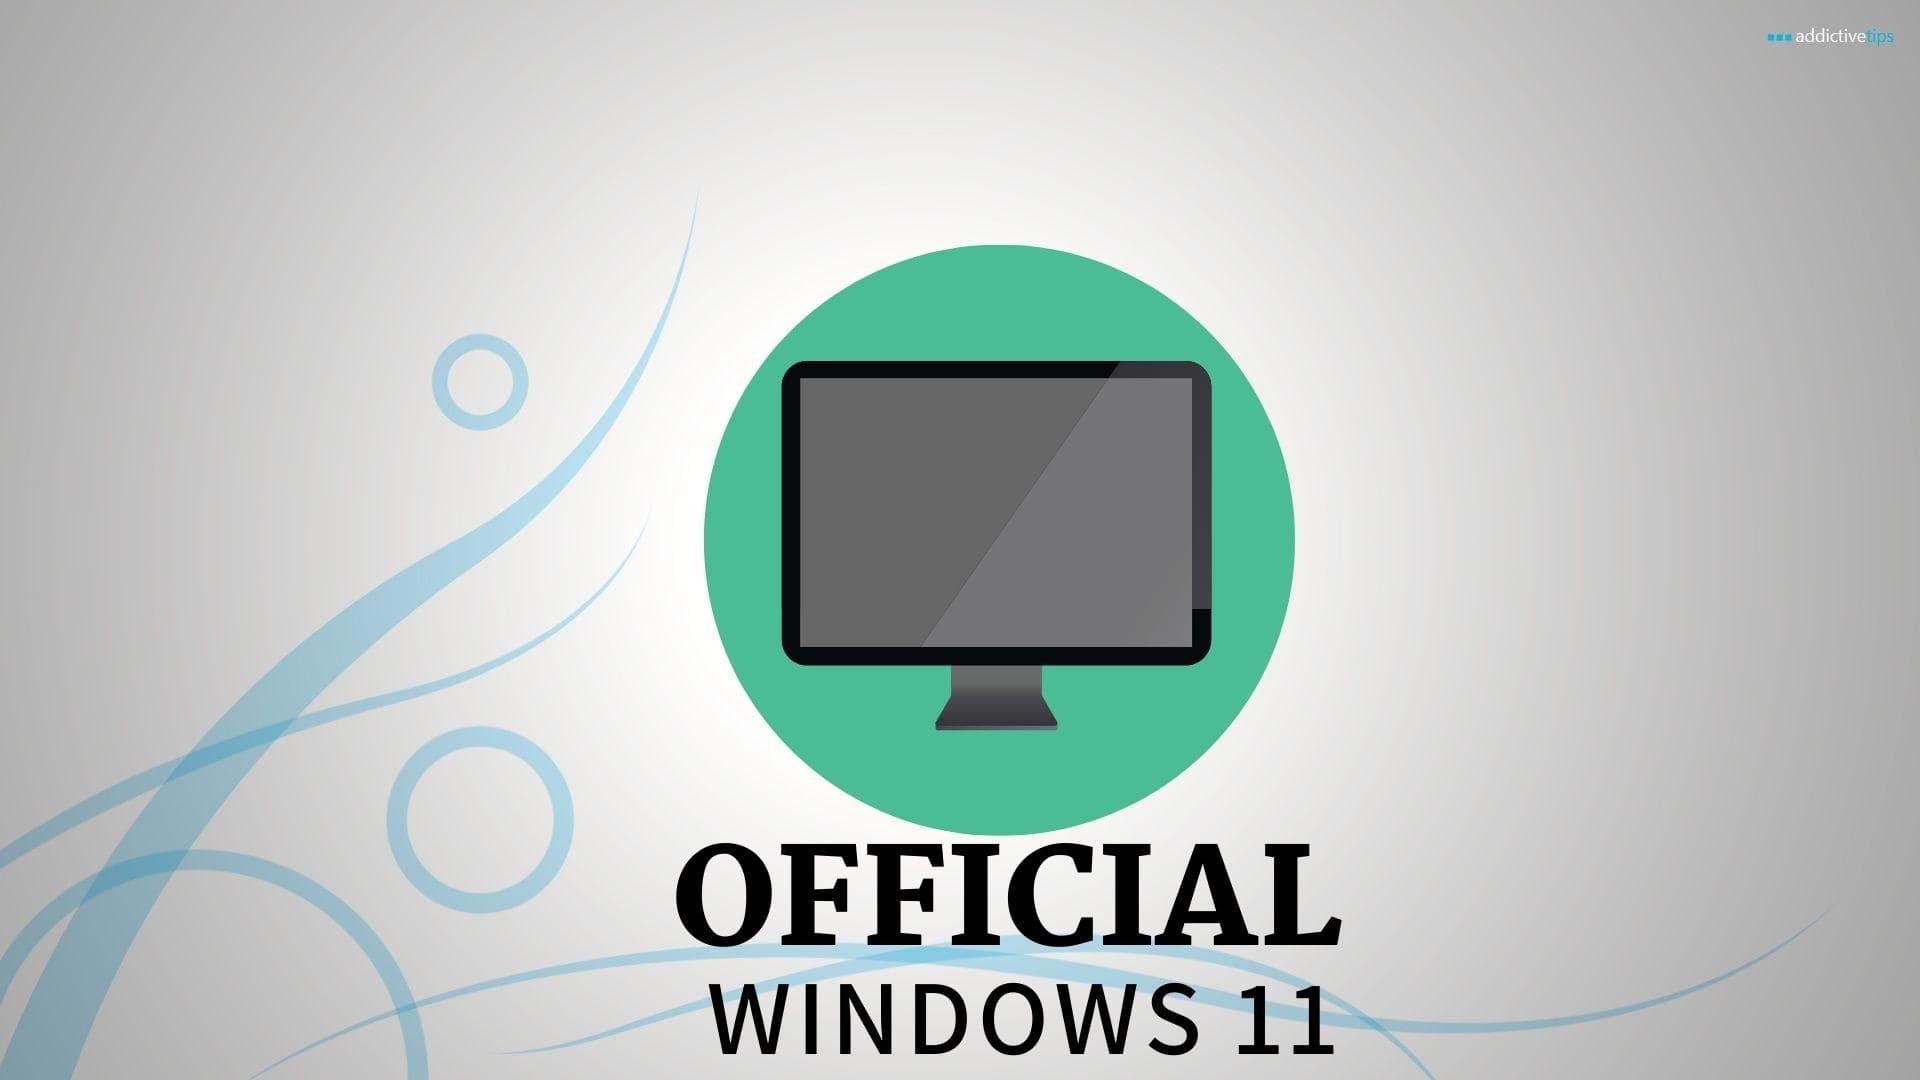 windows 11 news